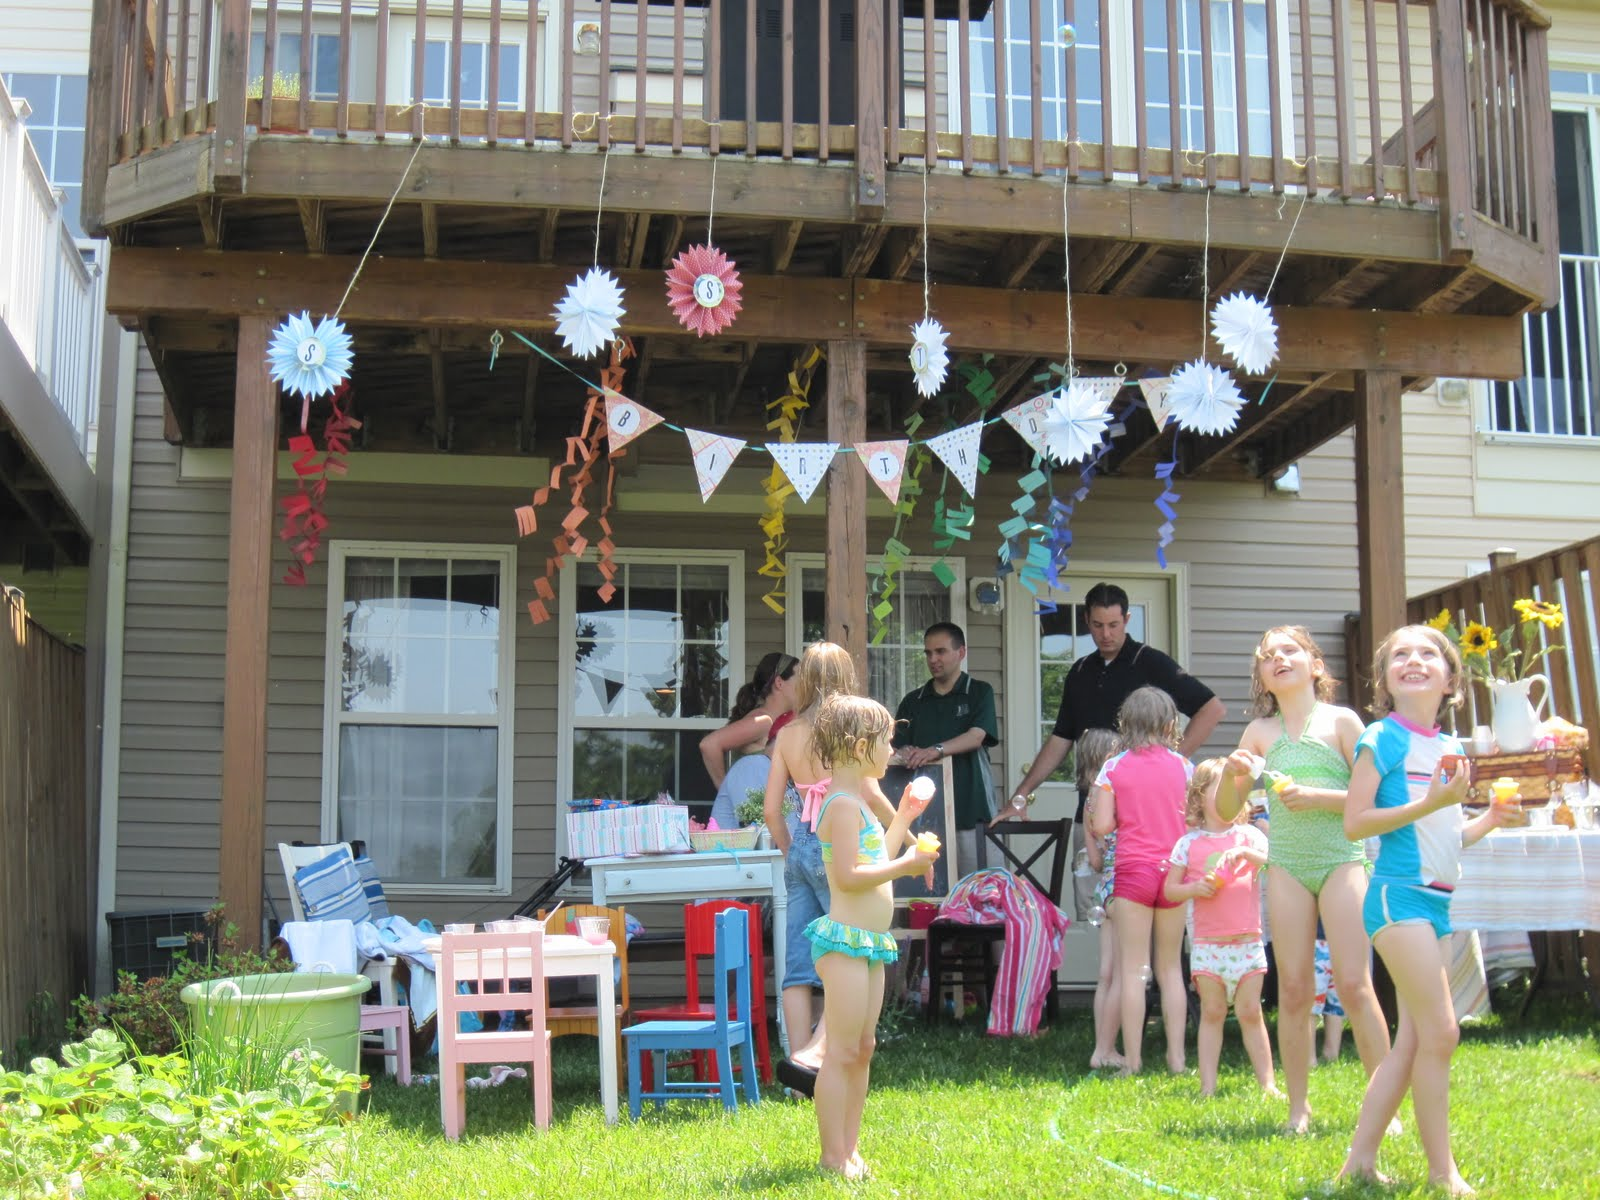 Laverty Family: A Backyard Birthday Party